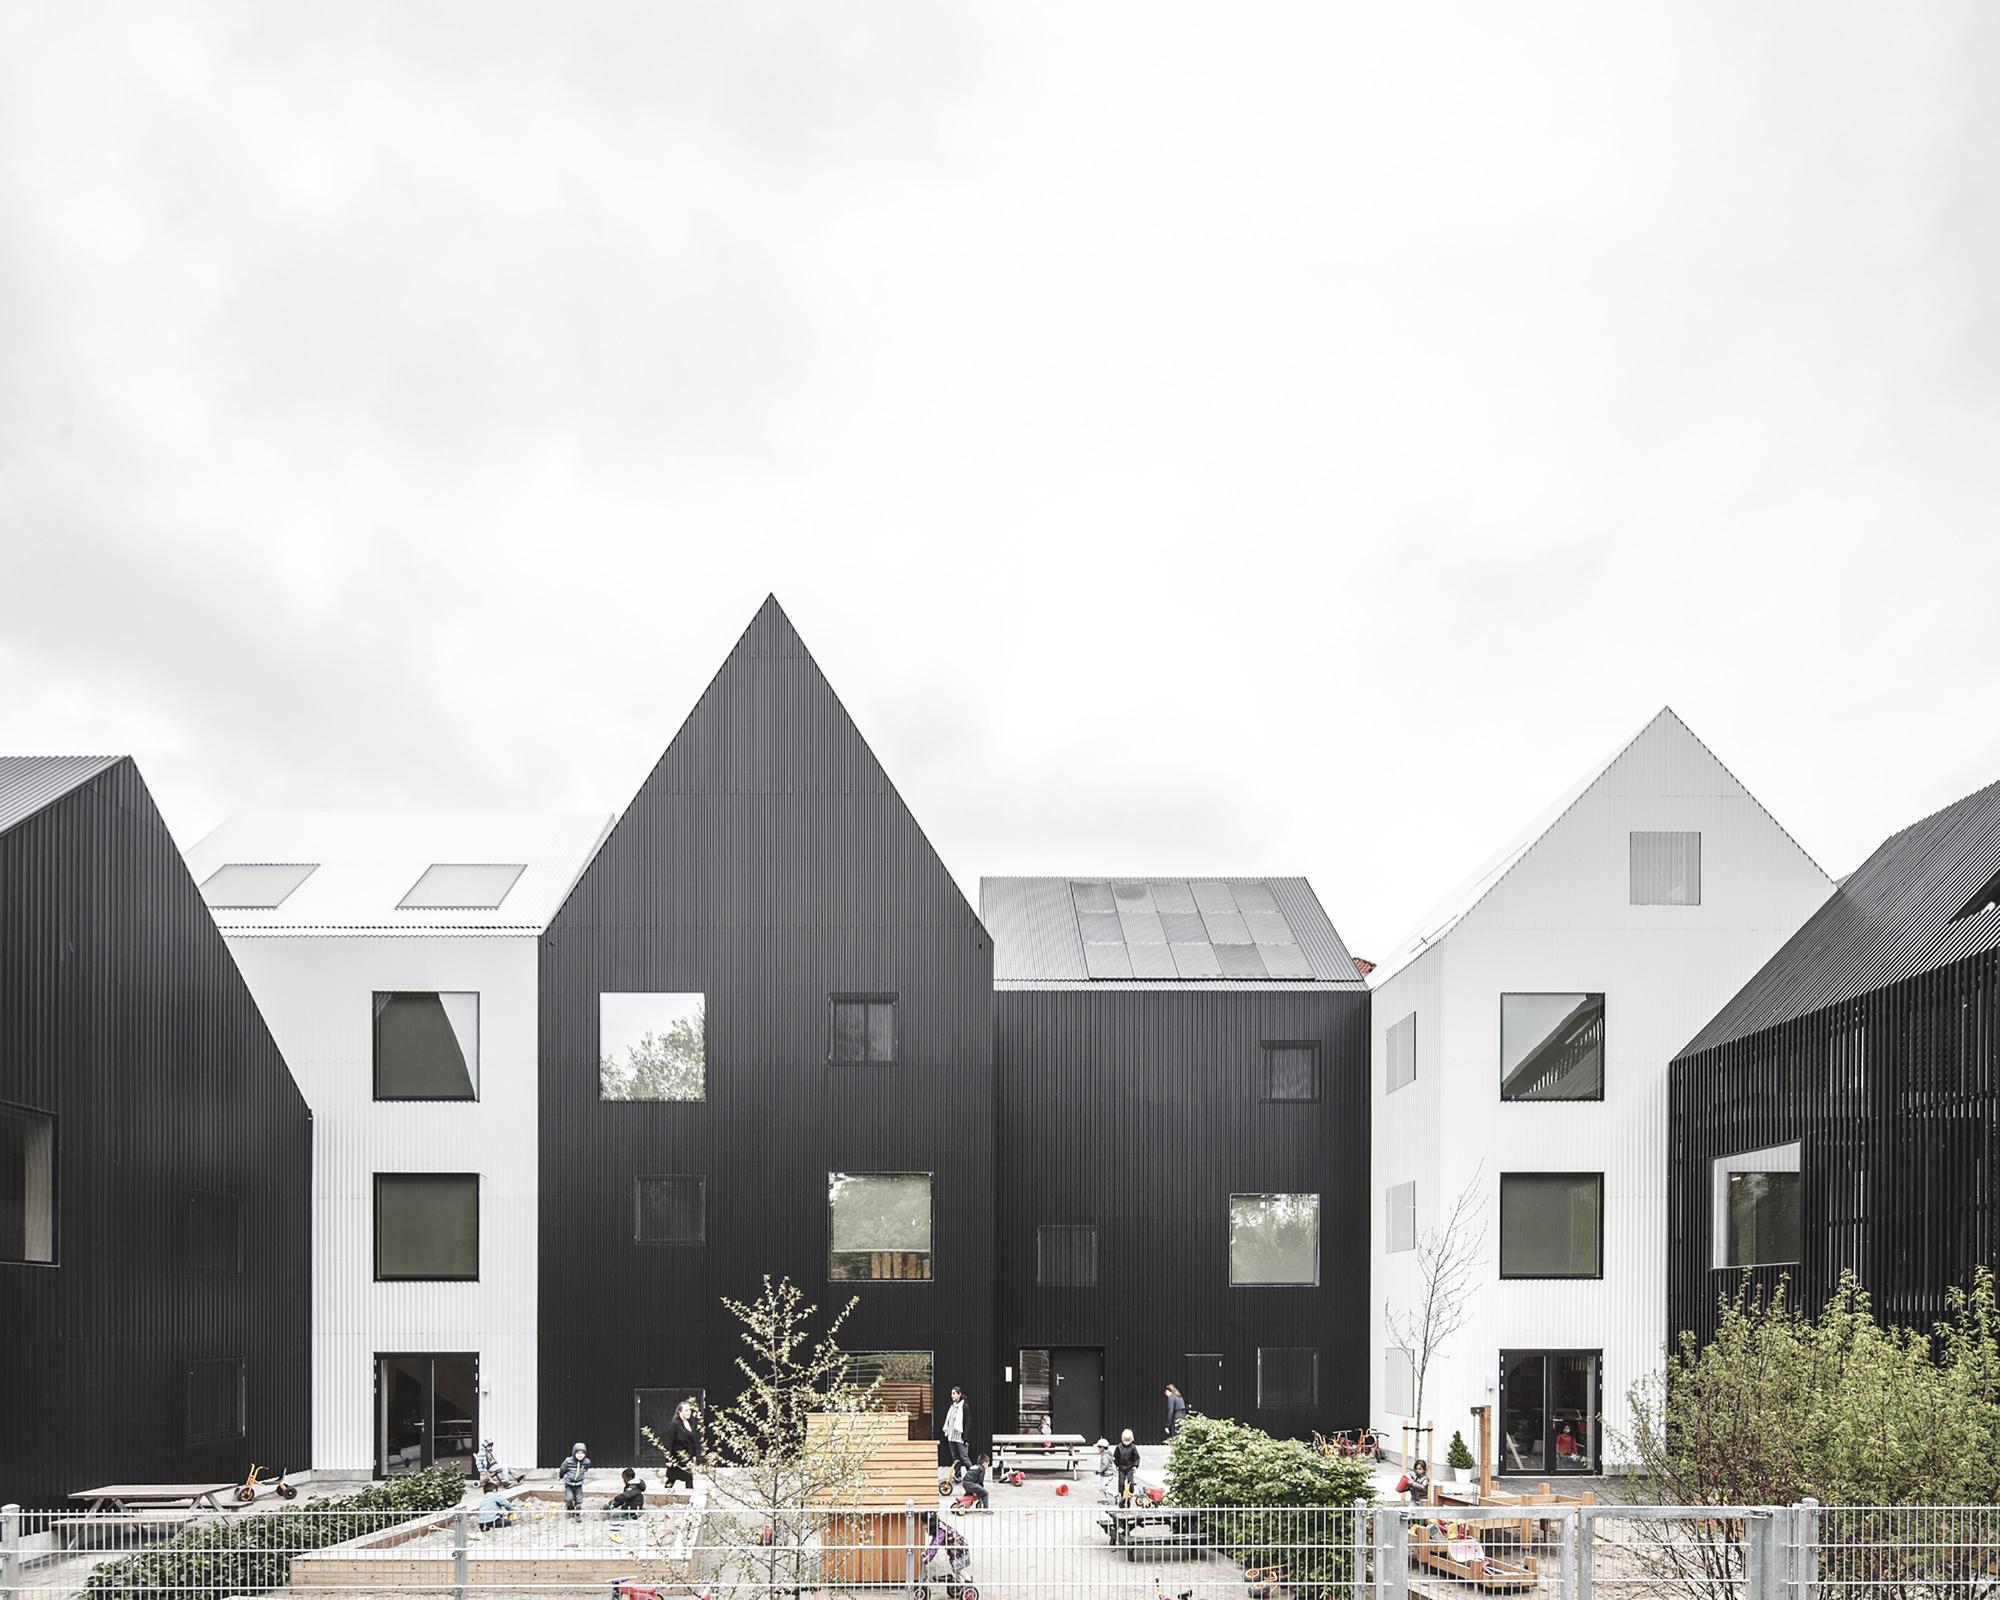 black and white gabled volumes for a Danish kindergarten